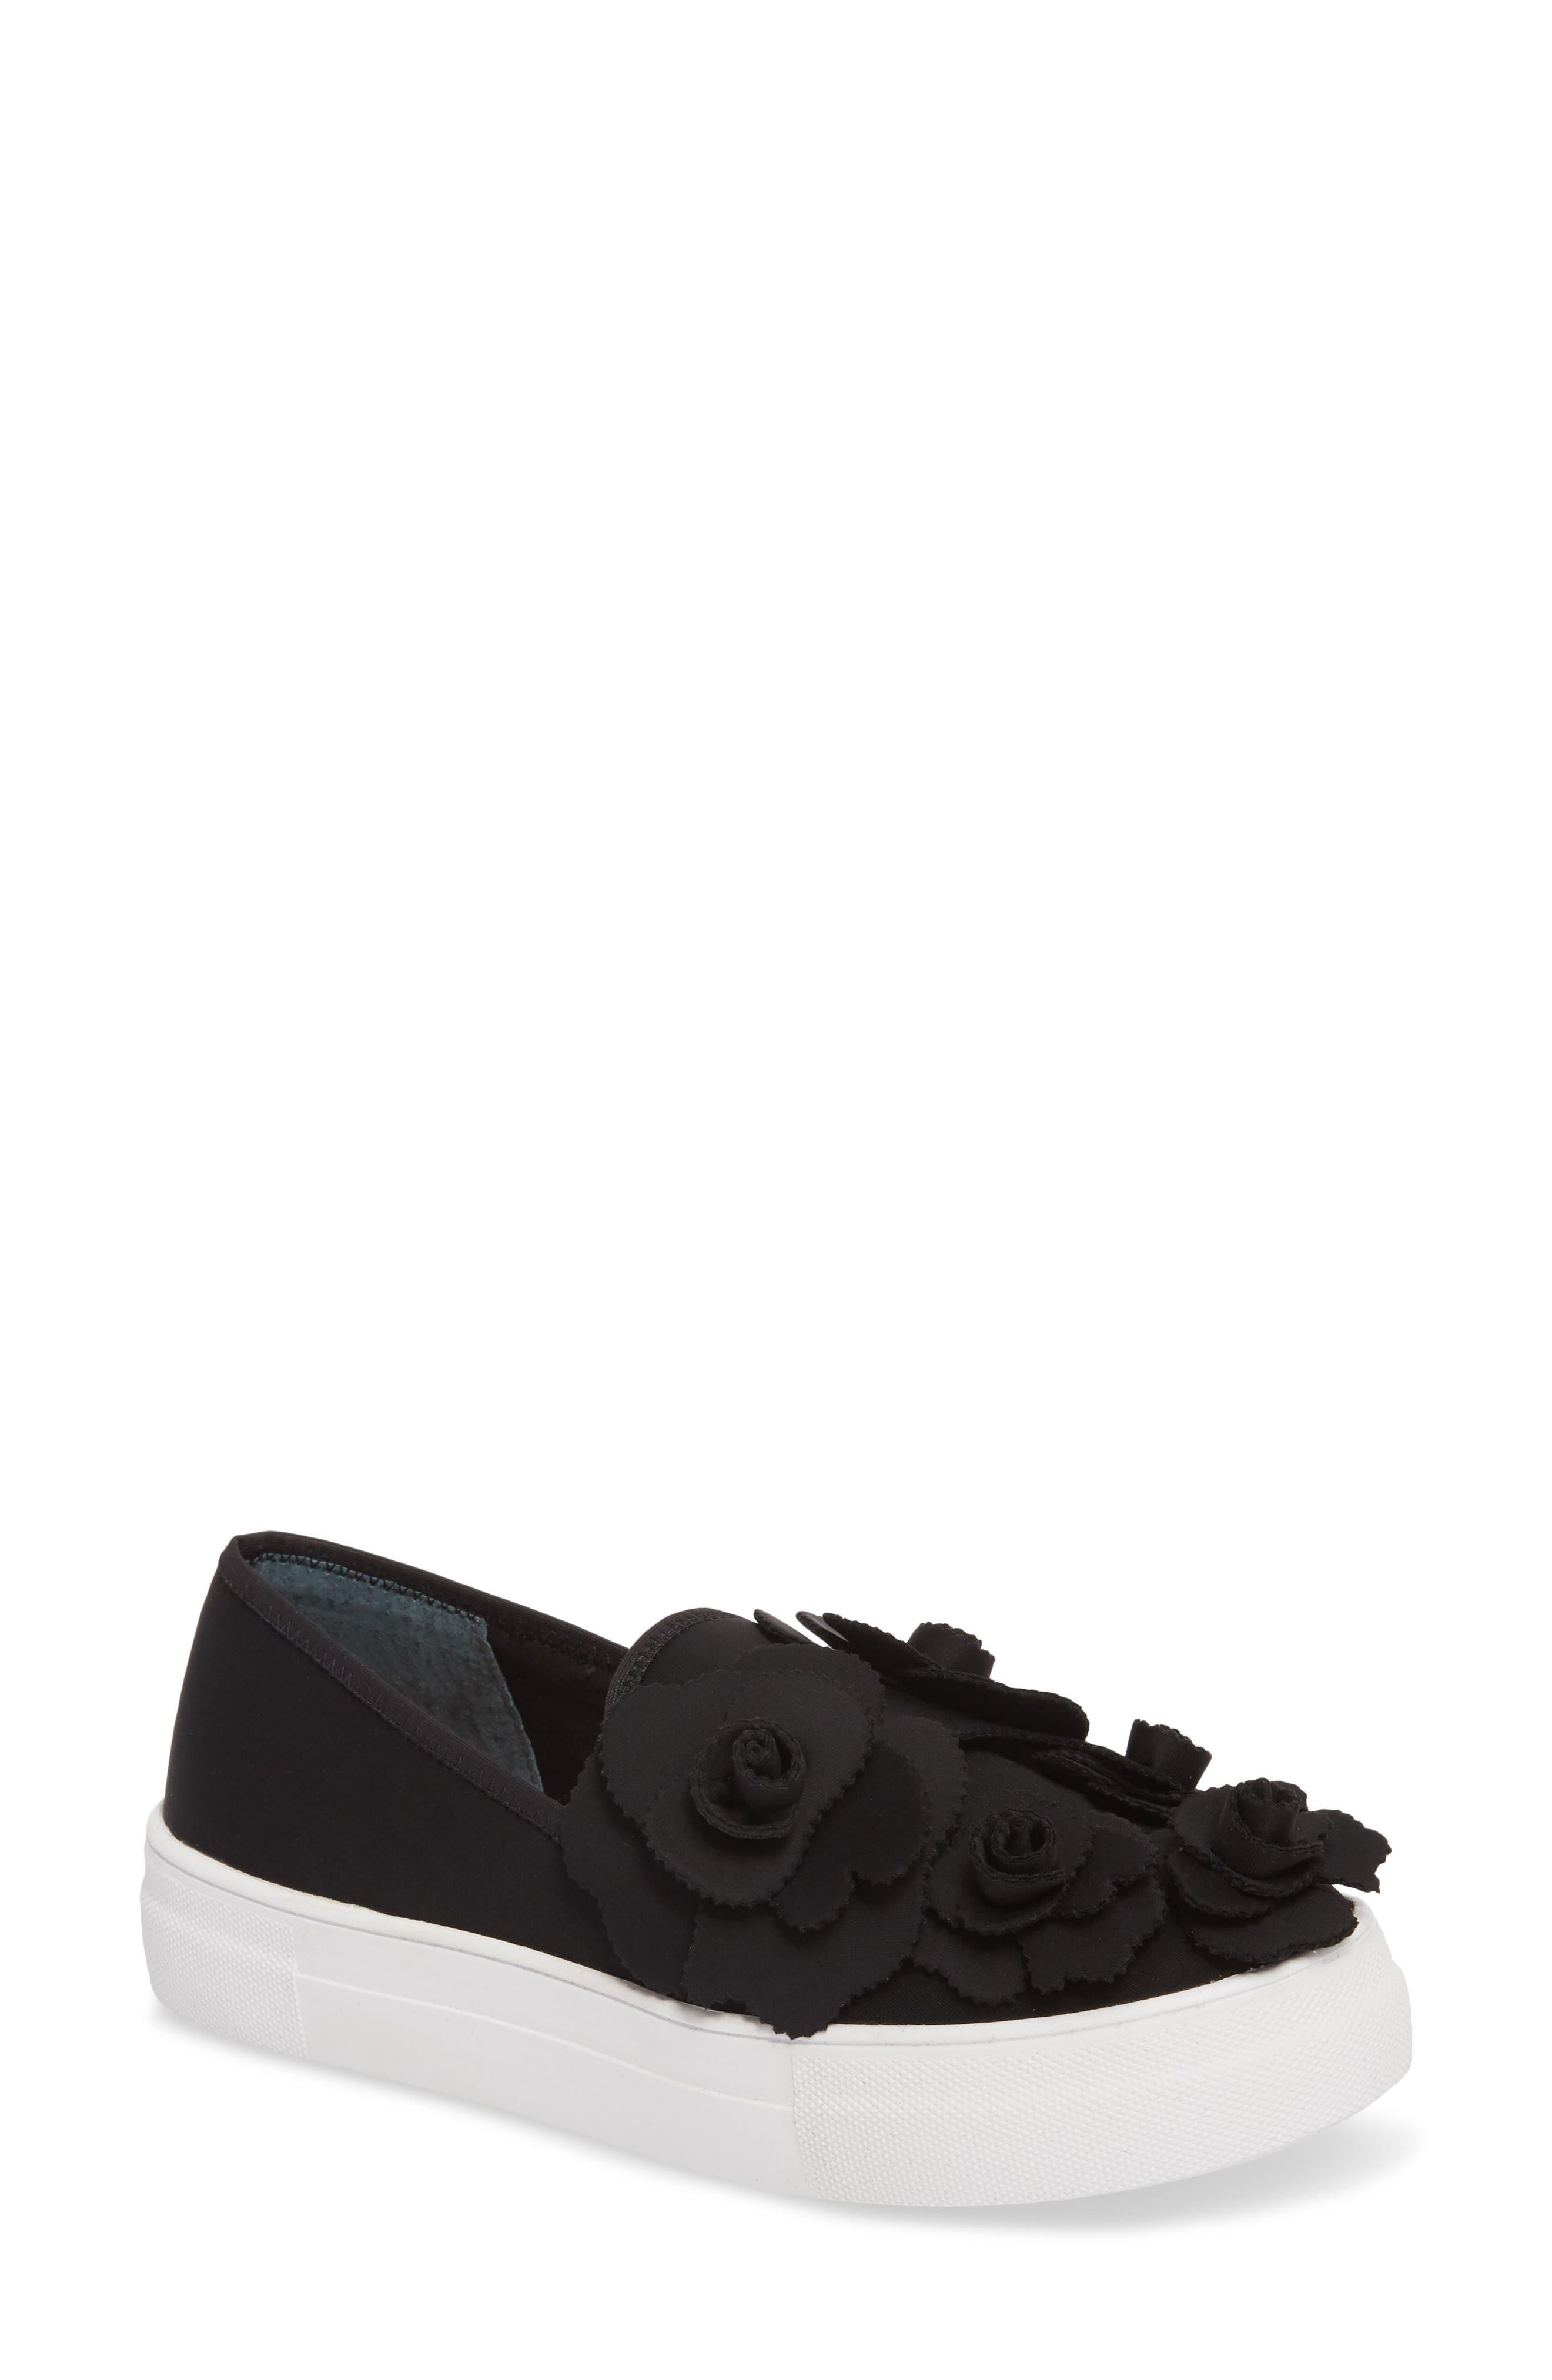 Alden Floral Embellished Slip-On Sneaker,                             Main thumbnail 1, color,                             Black Flower Neoprene